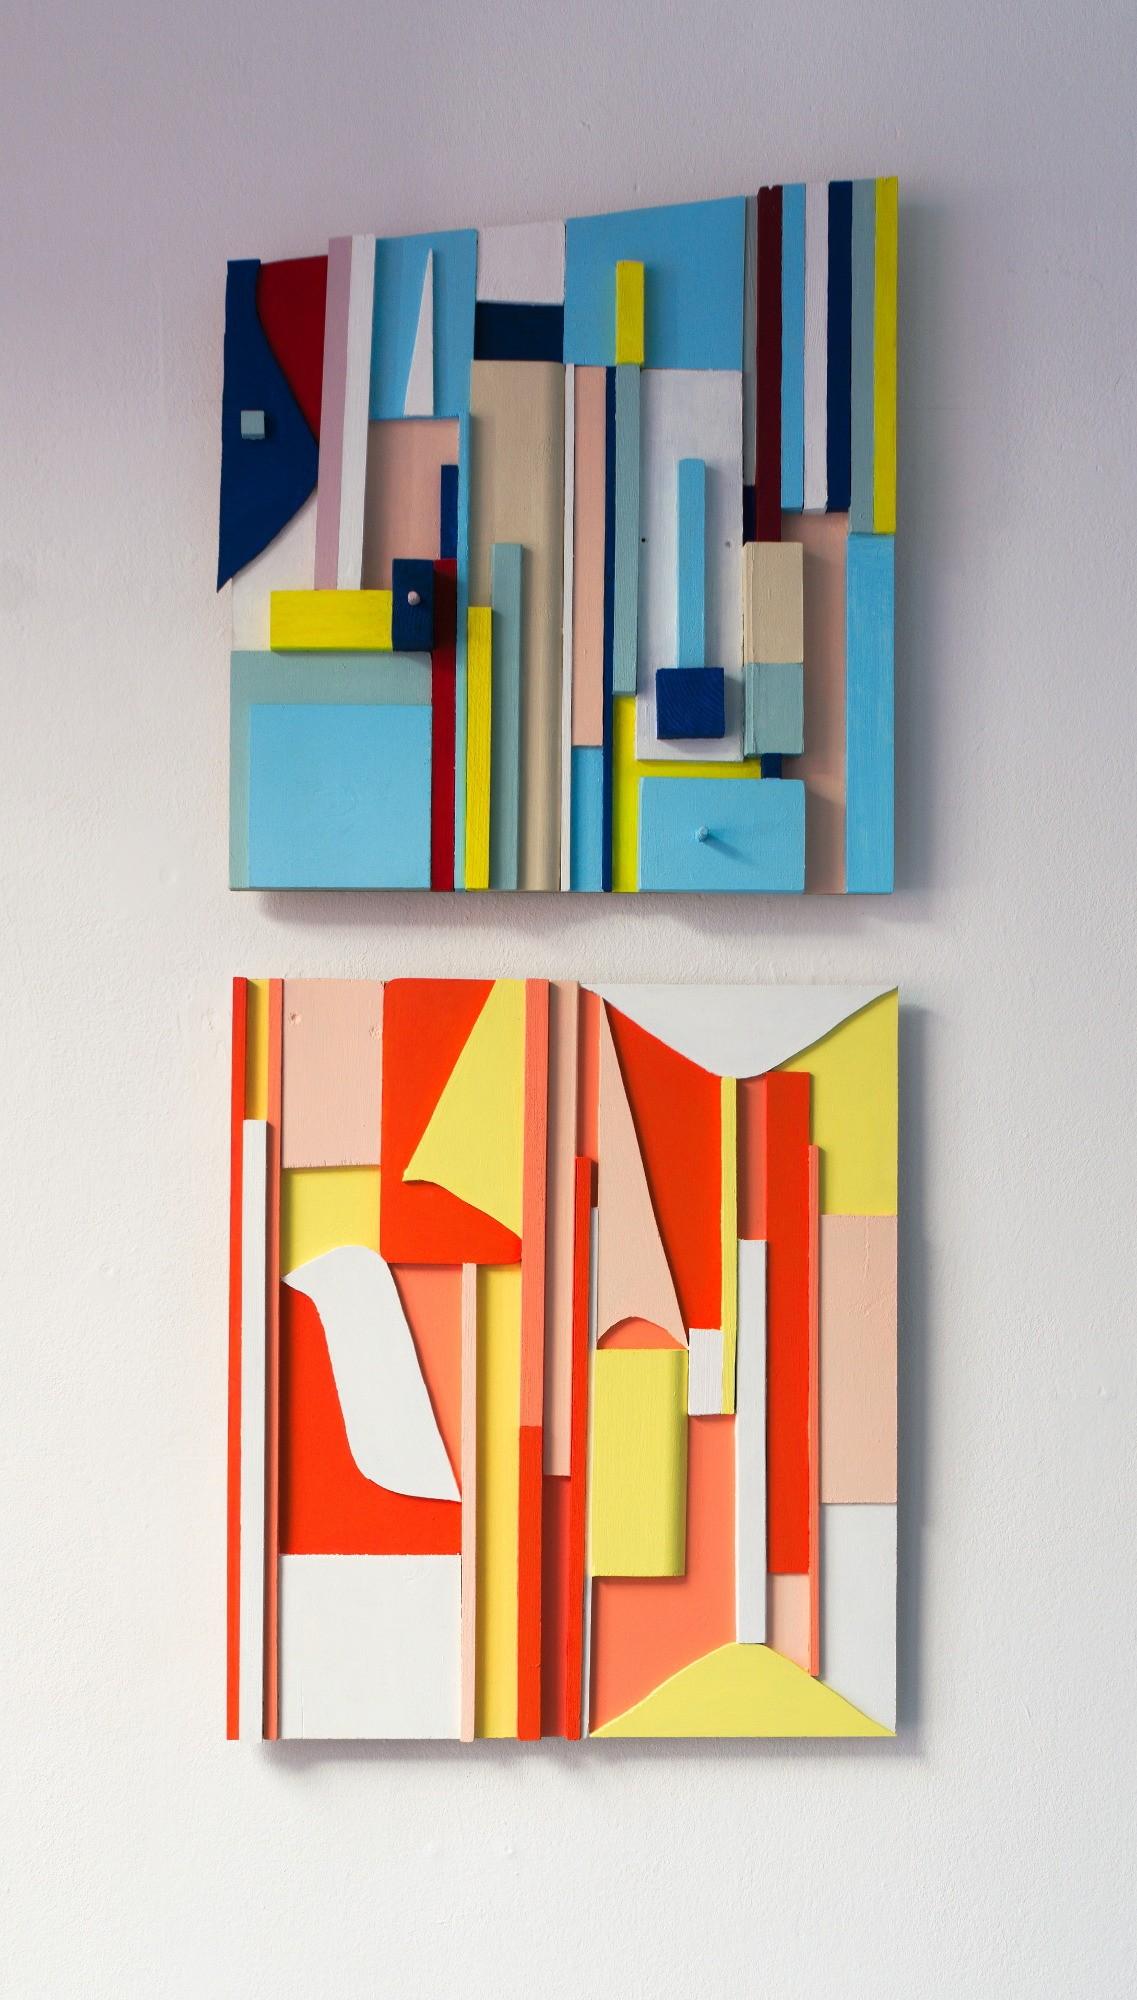 o.T. / Acrylfarbe auf Holz / 43 x 40 x 6 cm / 45,5 x 40 x 2 cm / 2015